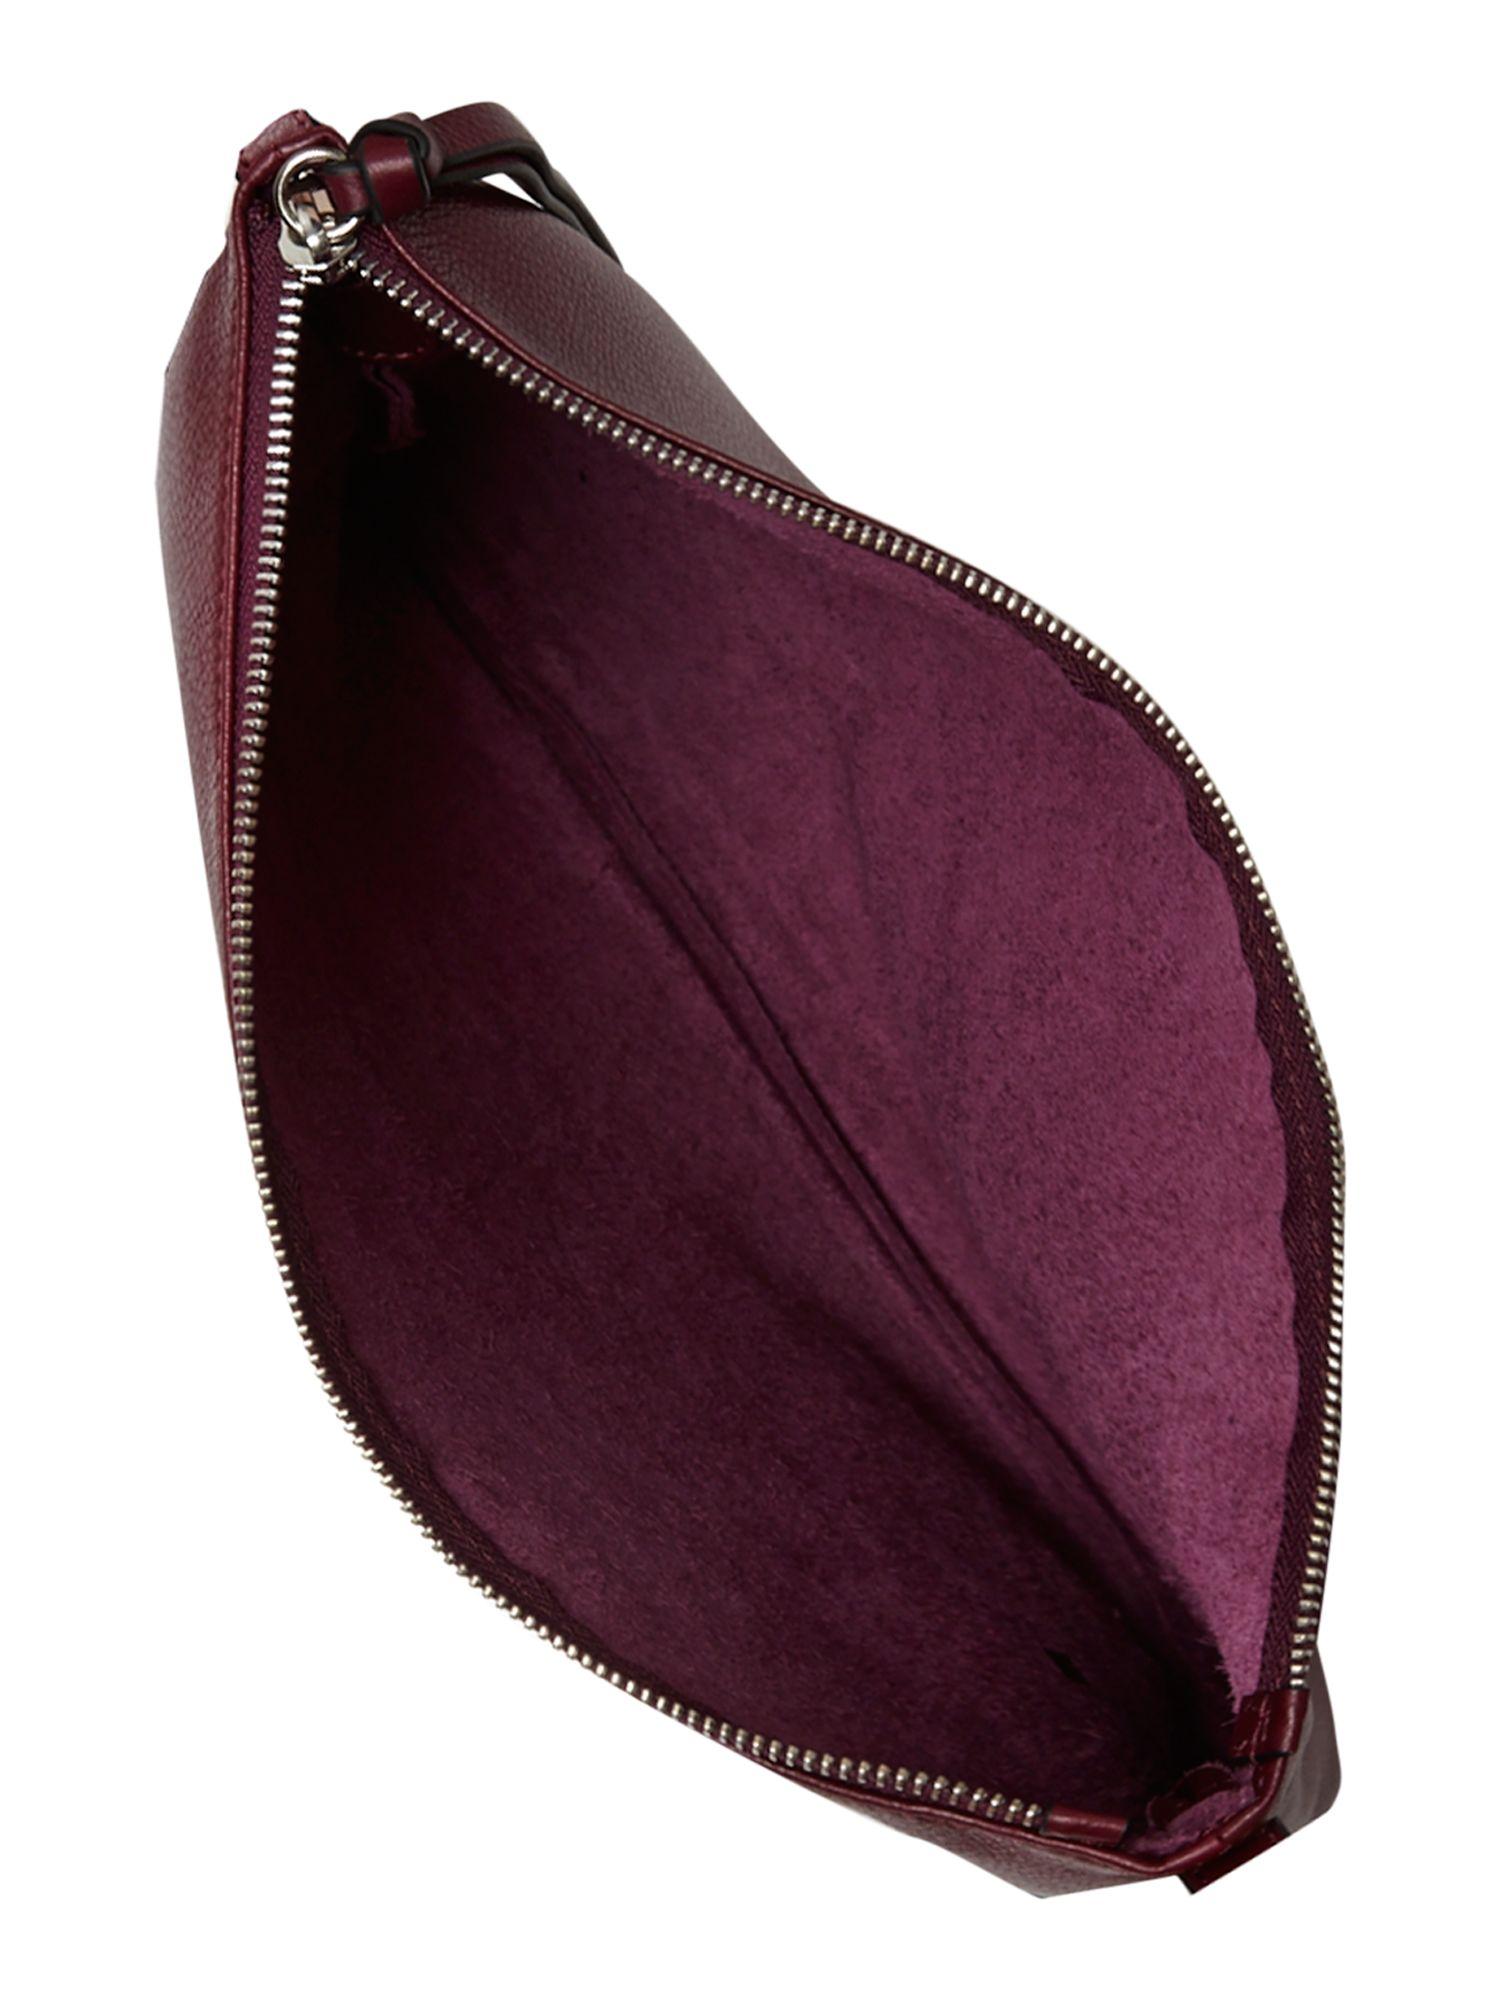 Coccinelle Purple Cross Body Bag